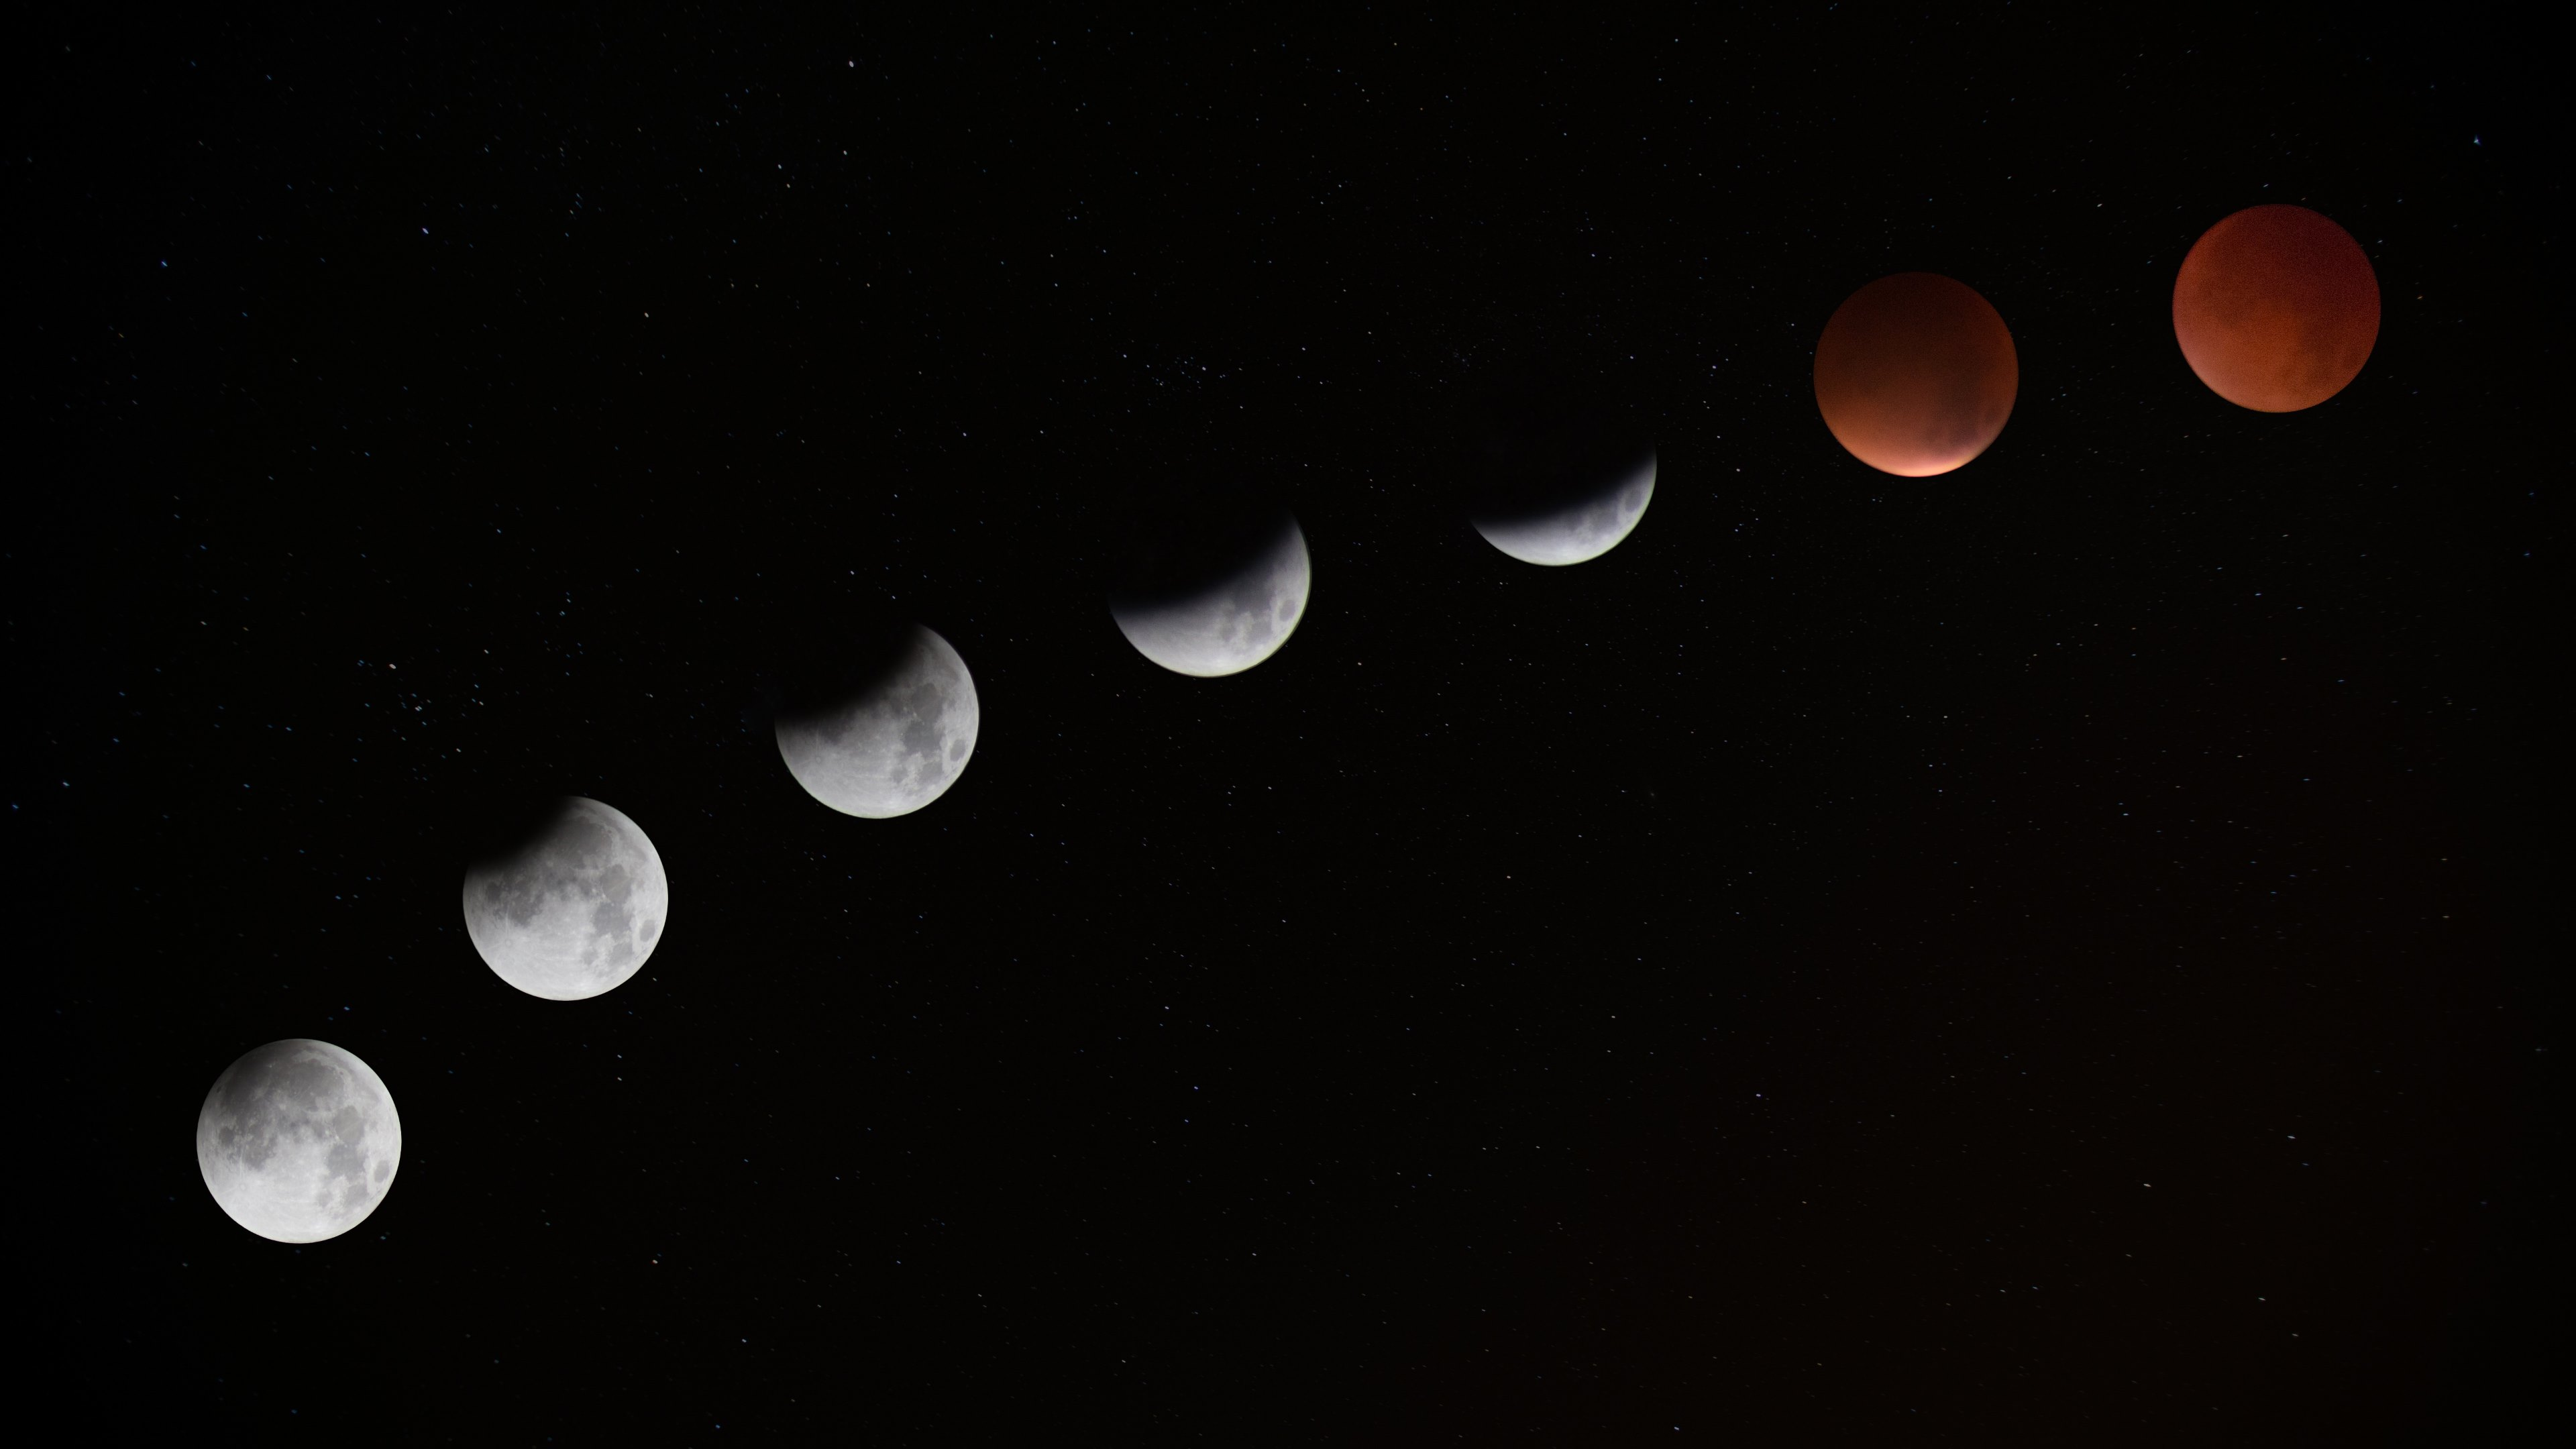 46+] Blood Moon Wallpaper iPhone on ...